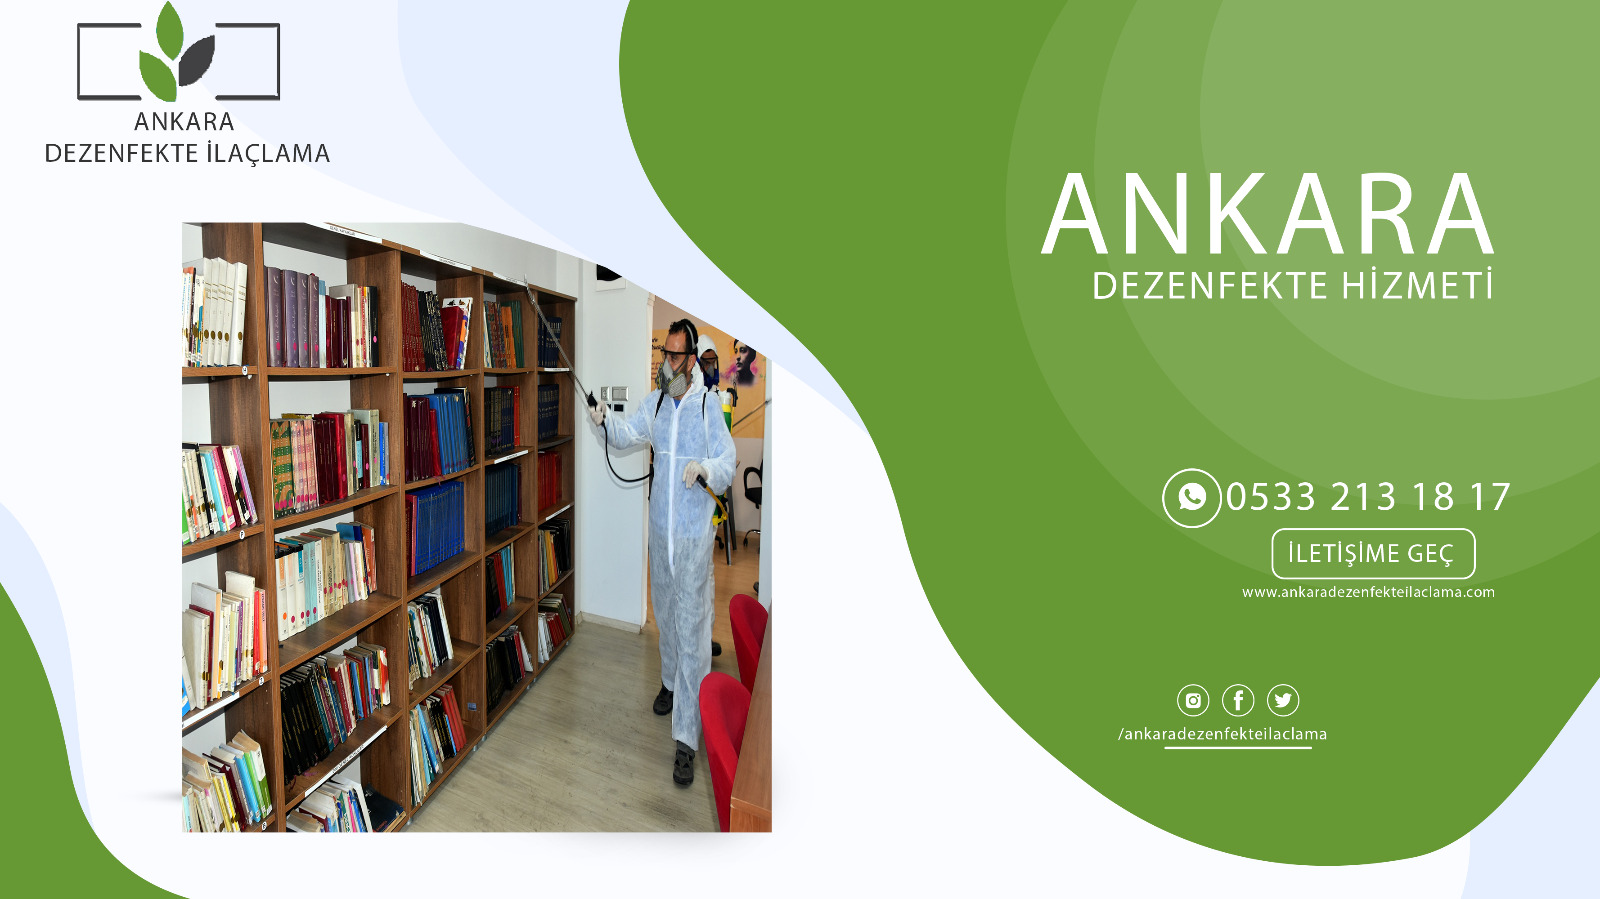 Ankara Dezenfekte İlaçlama